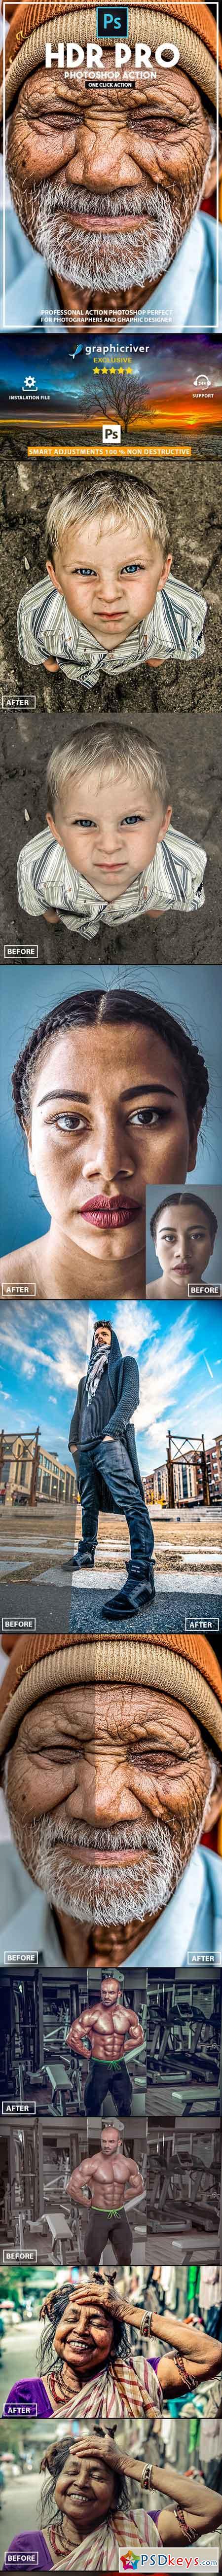 HDR PRO - Photoshop Action 22968156